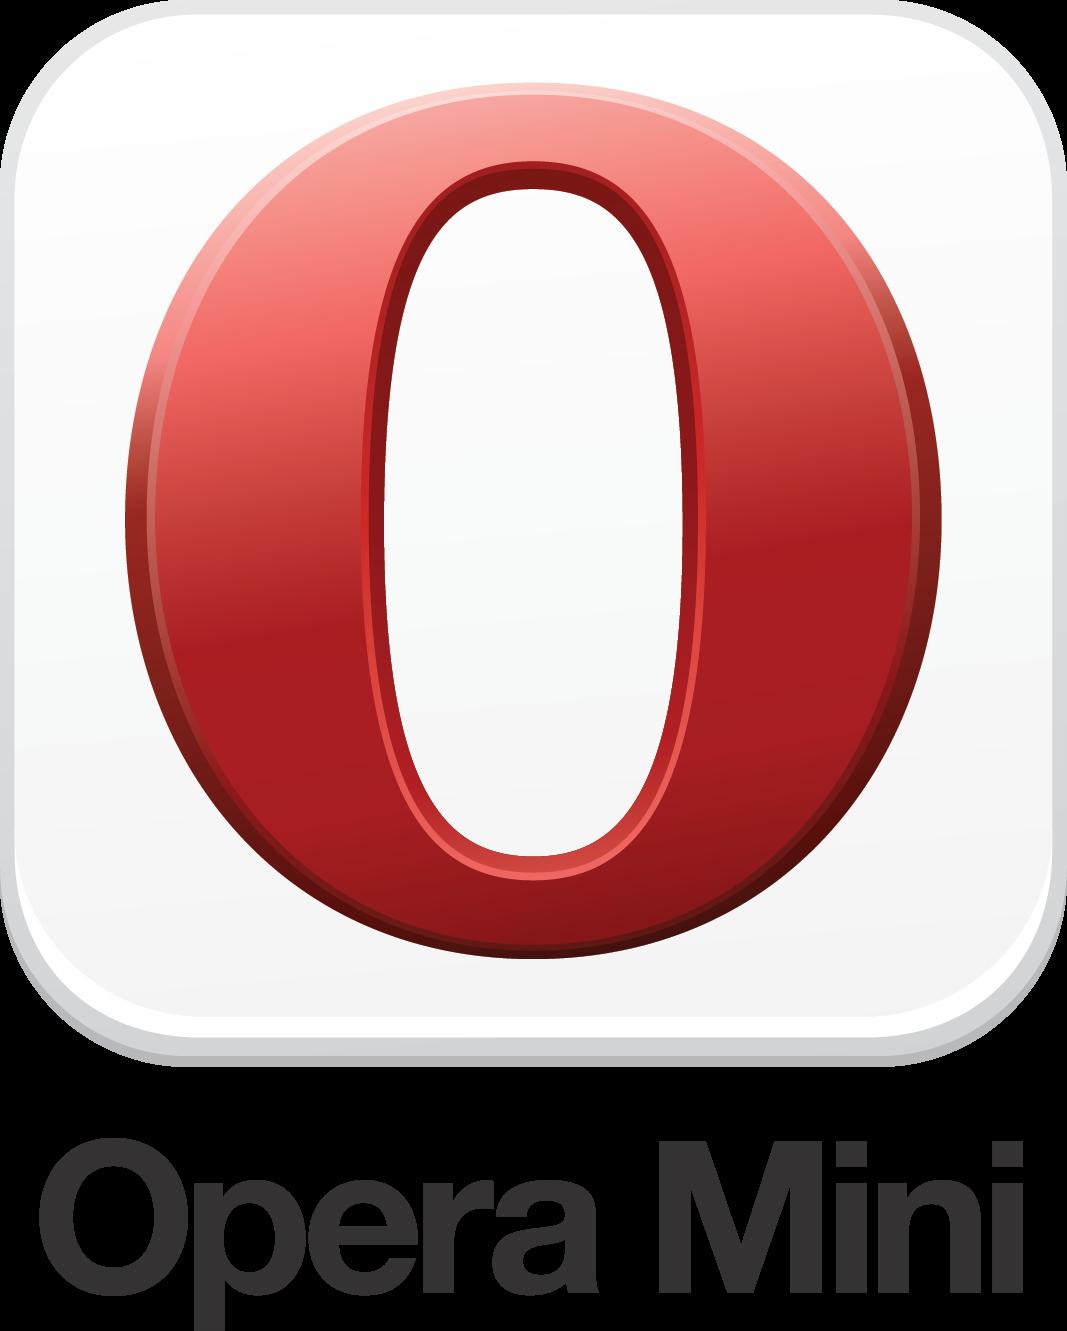 Latest Version Of Opera Mini For Mobile Download